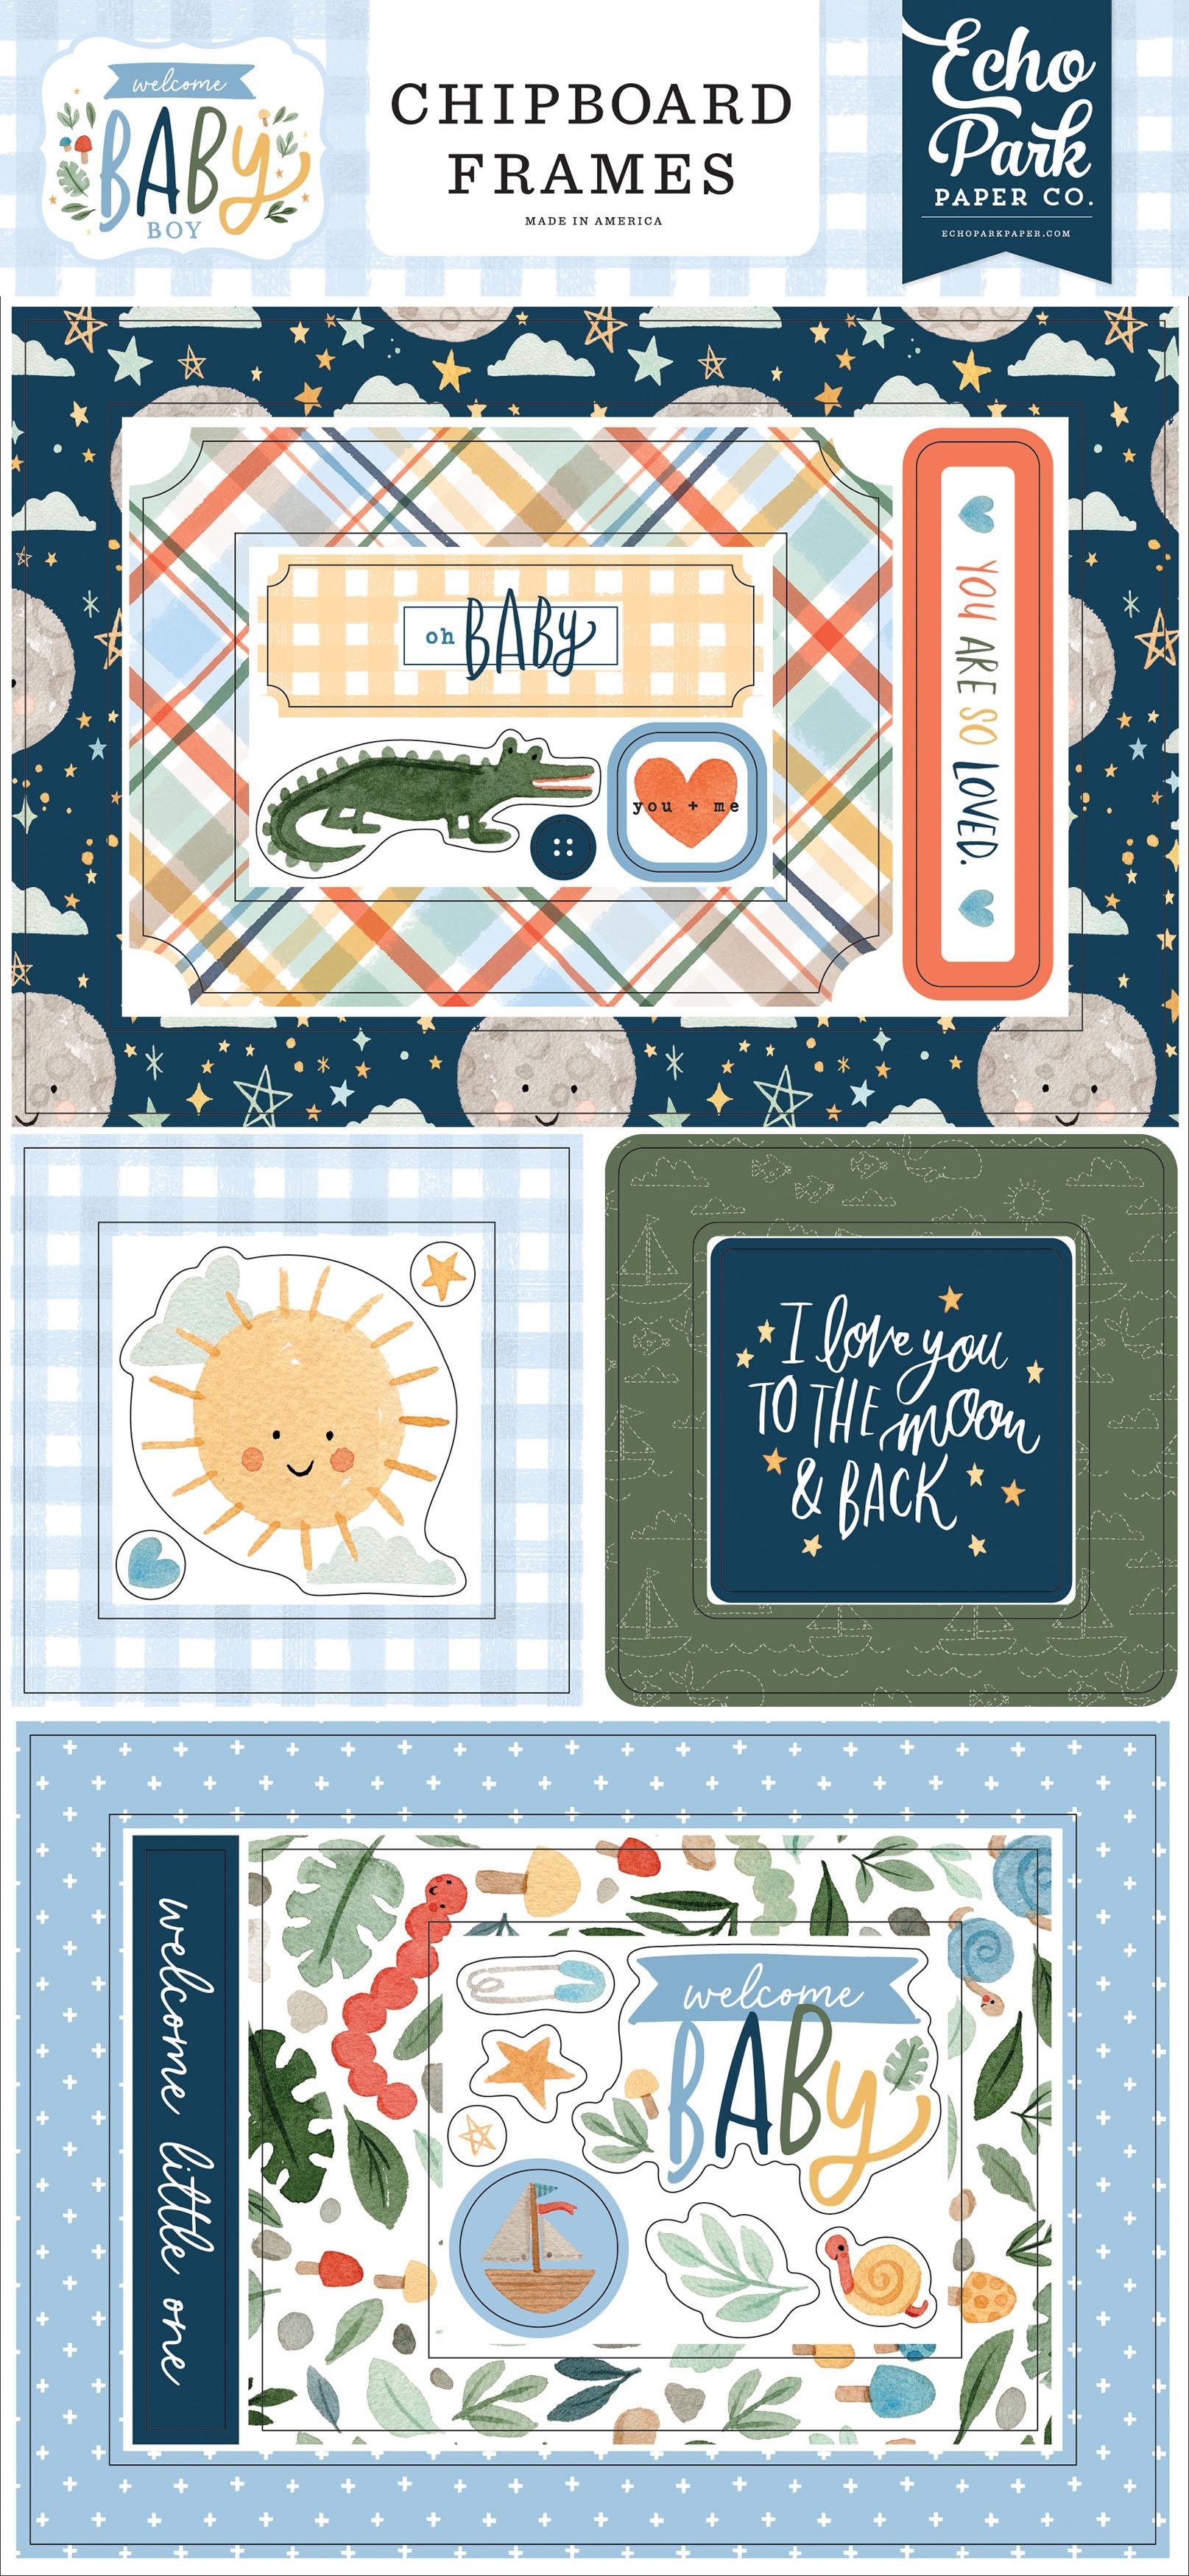 Echo Park - Welcome Baby Boy - Chipboard Frames